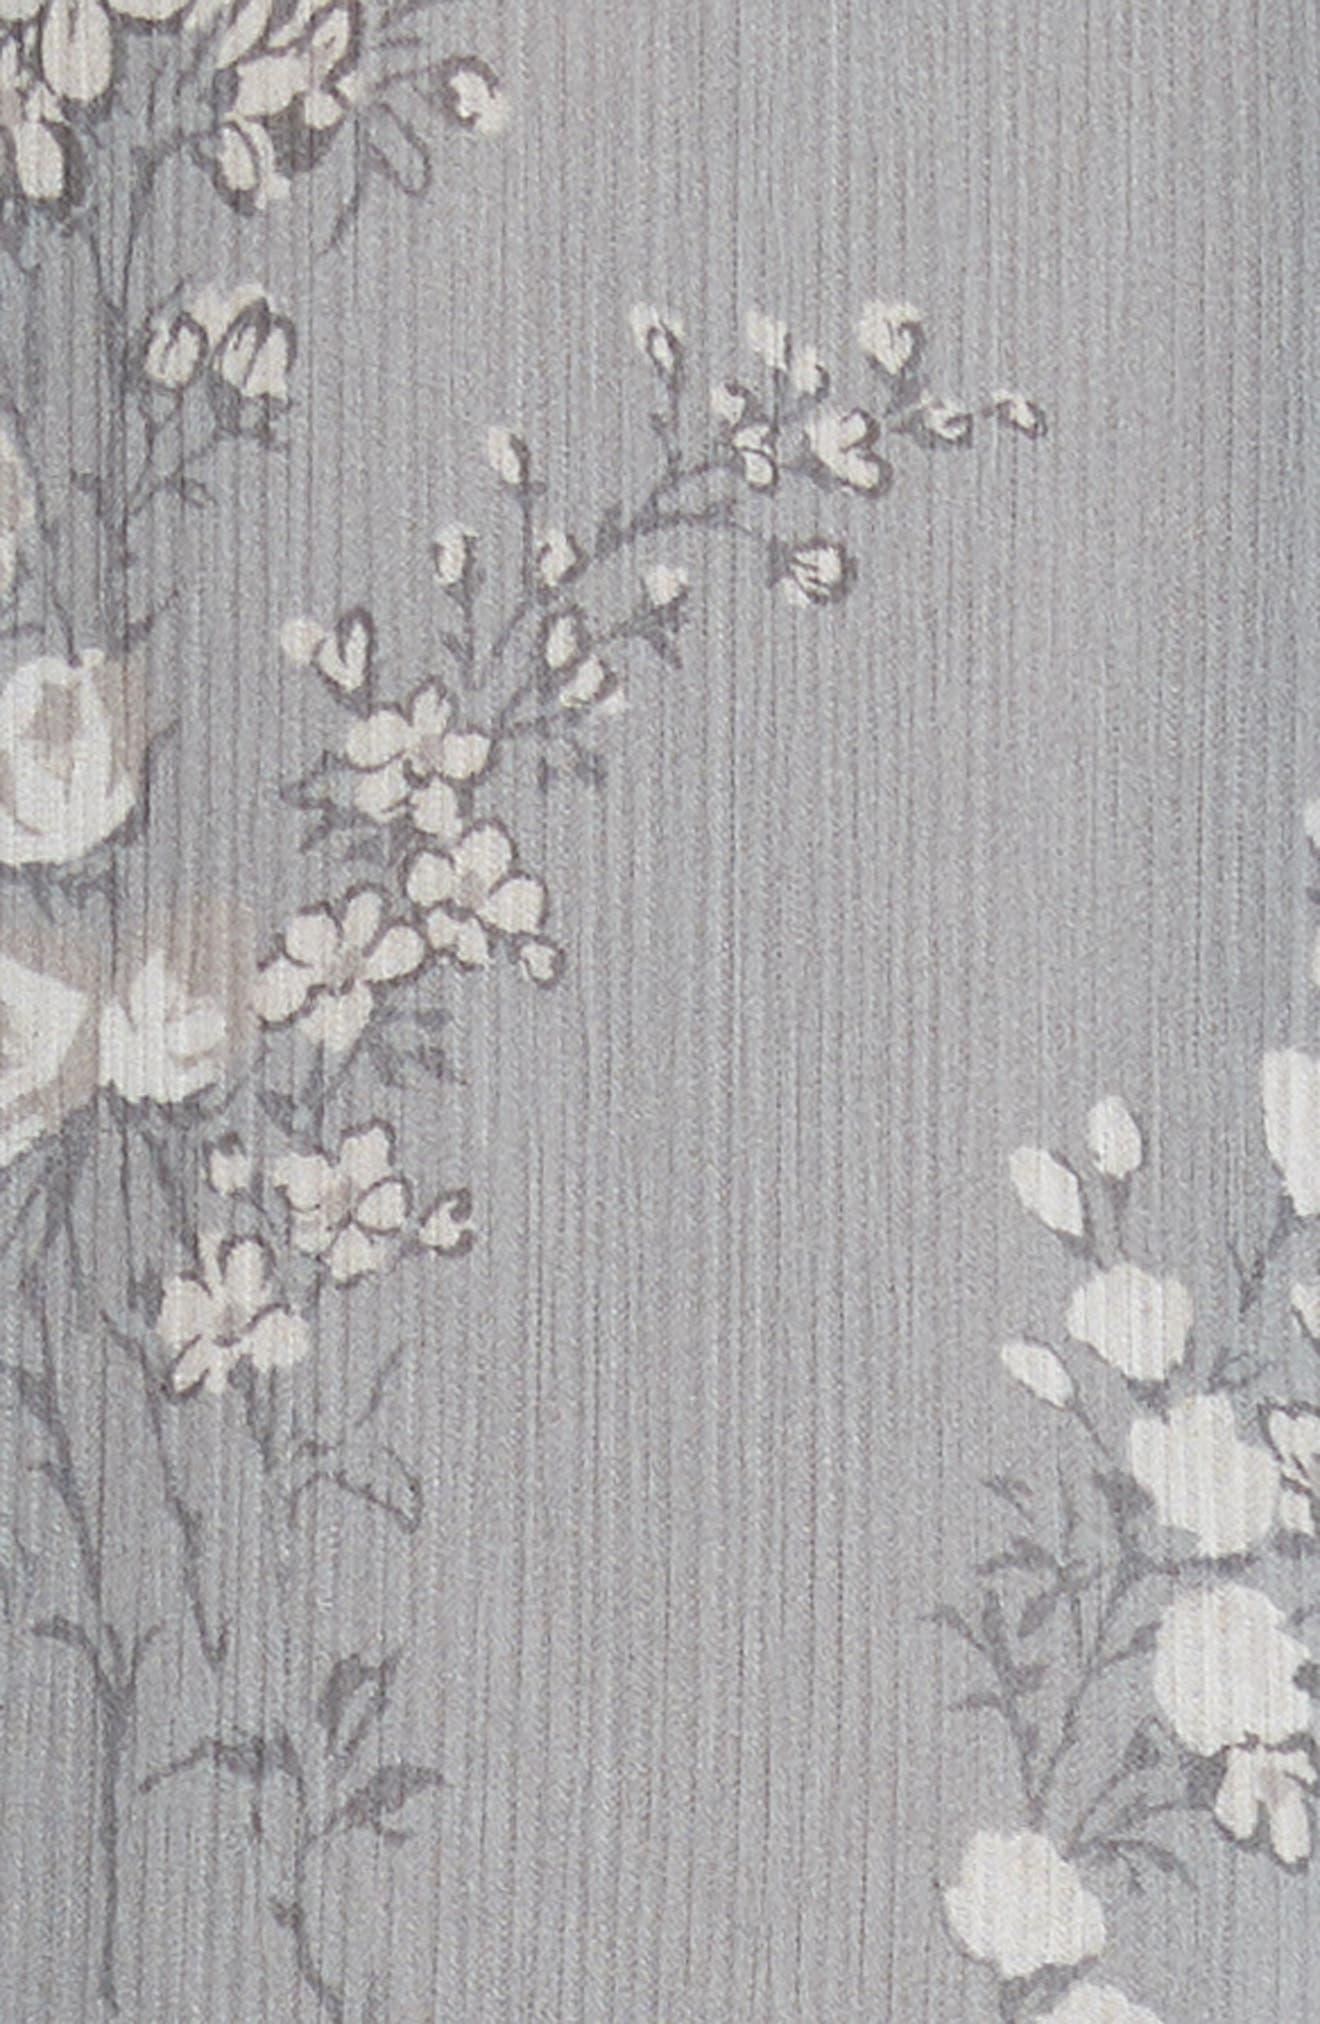 Floral Print Crinkle Chiffon Tie Neck Dress,                             Alternate thumbnail 6, color,                             GREY